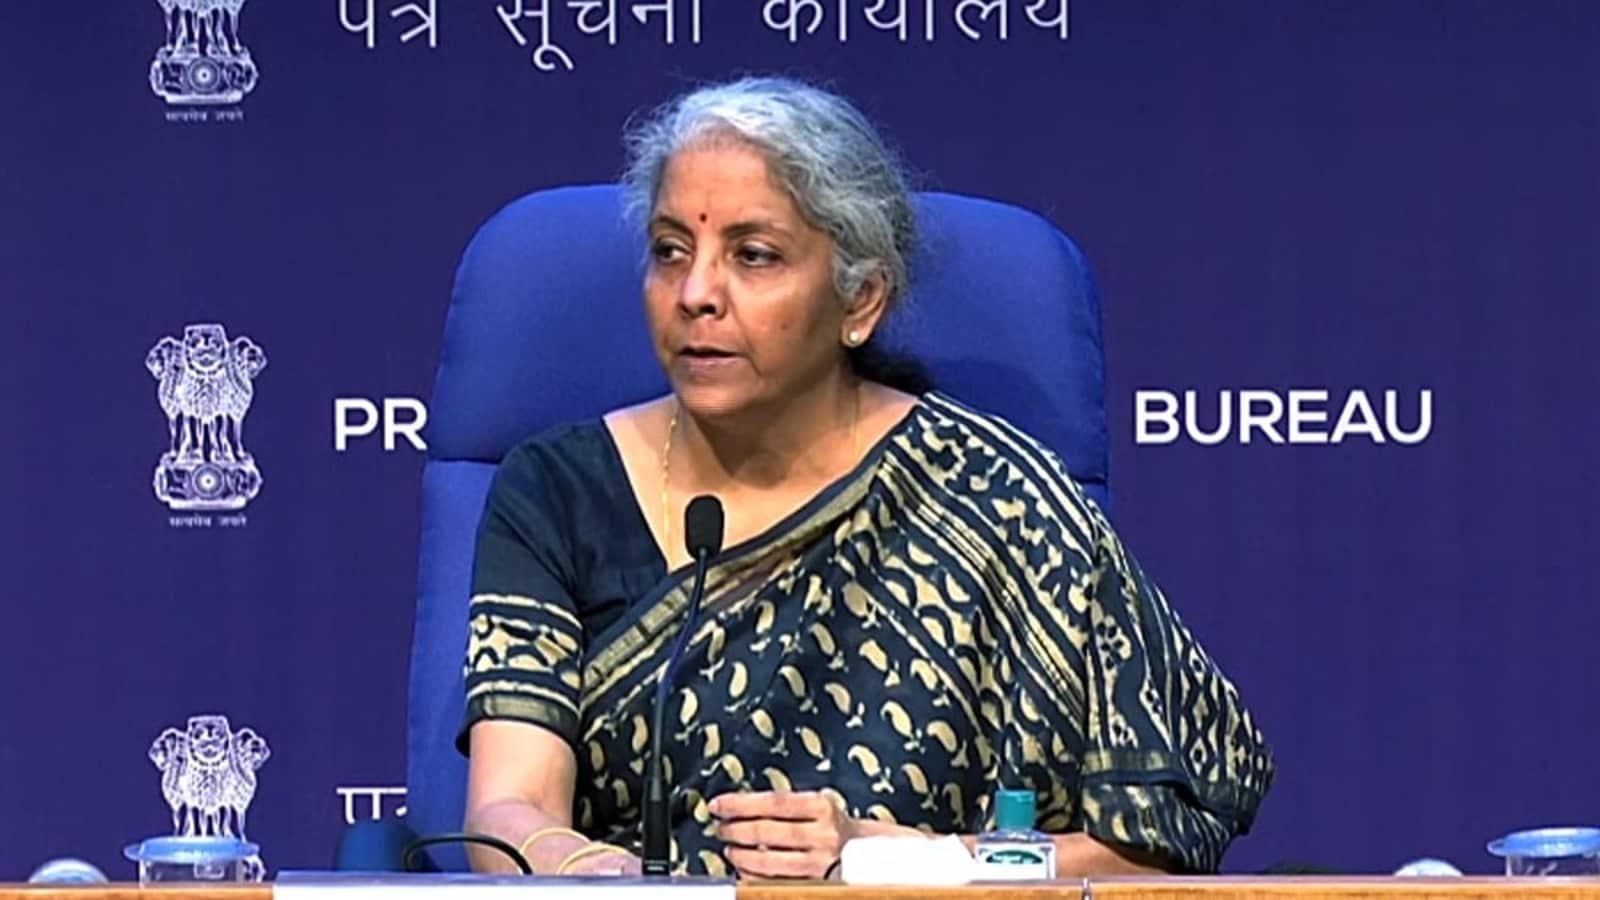 Nirmala Sitharaman meets Infosys officials, reviews tech glitches on I-T e-filing portal   Latest News India - Hindustan Times